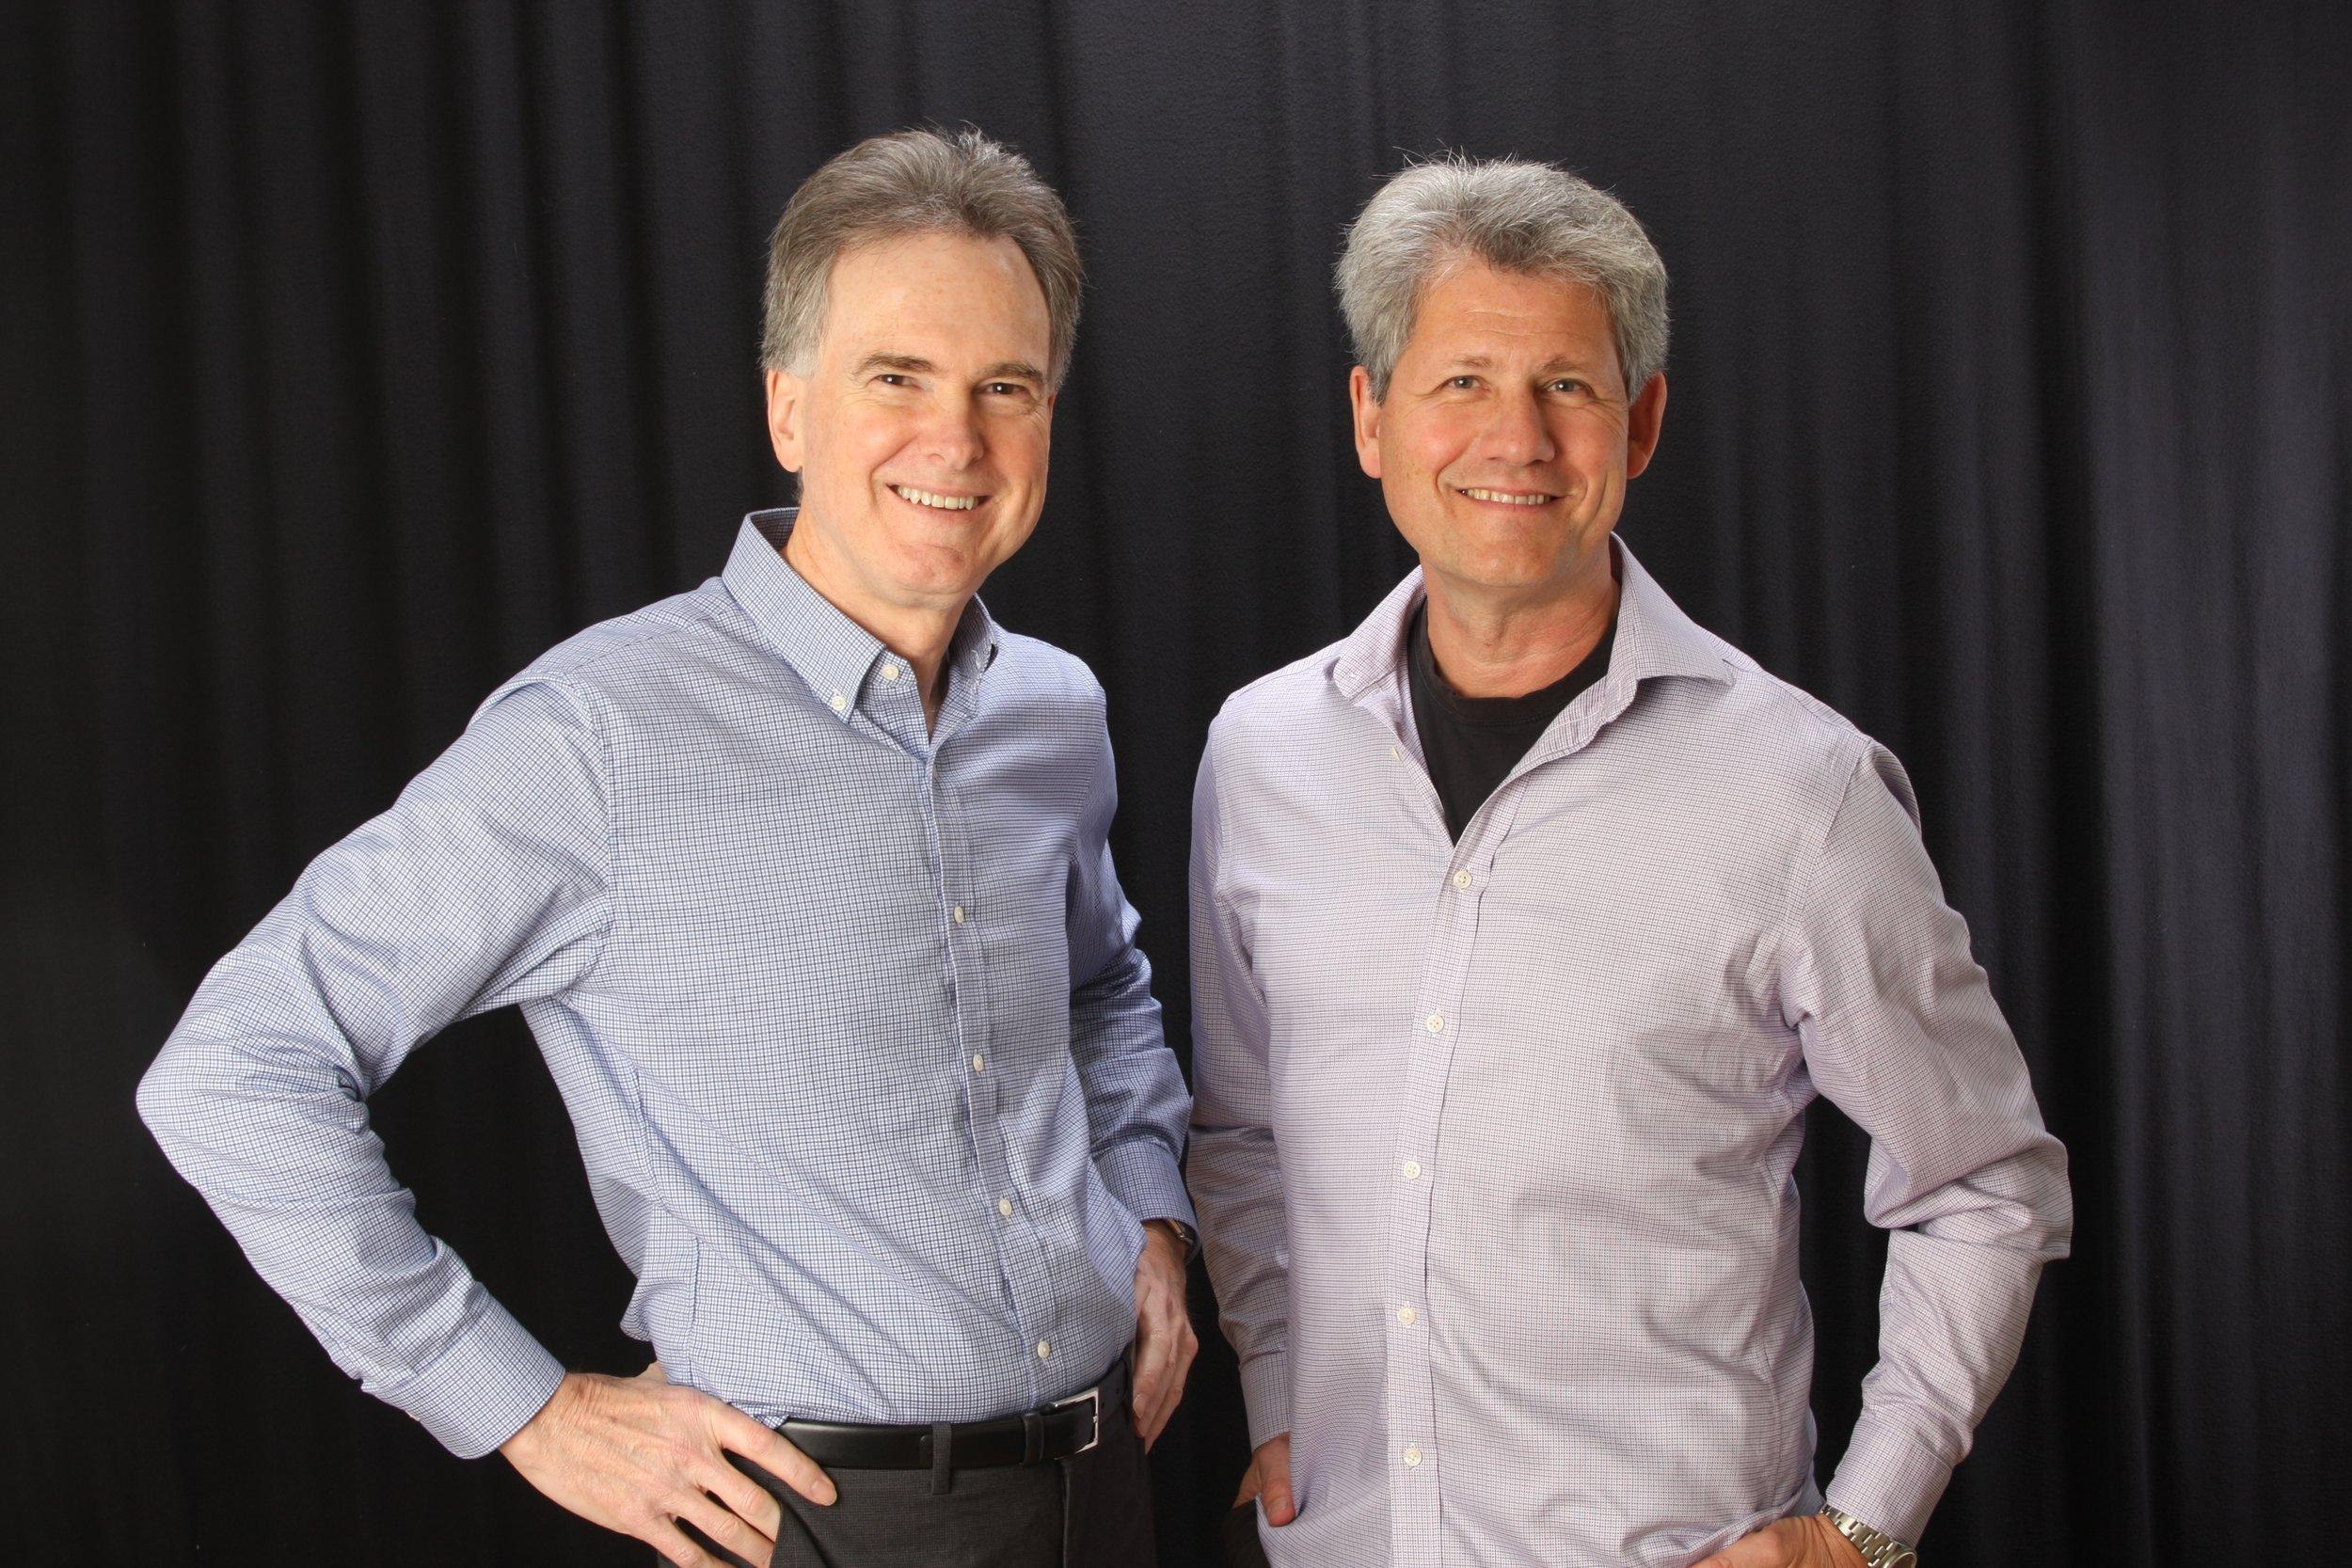 Alan and Denis